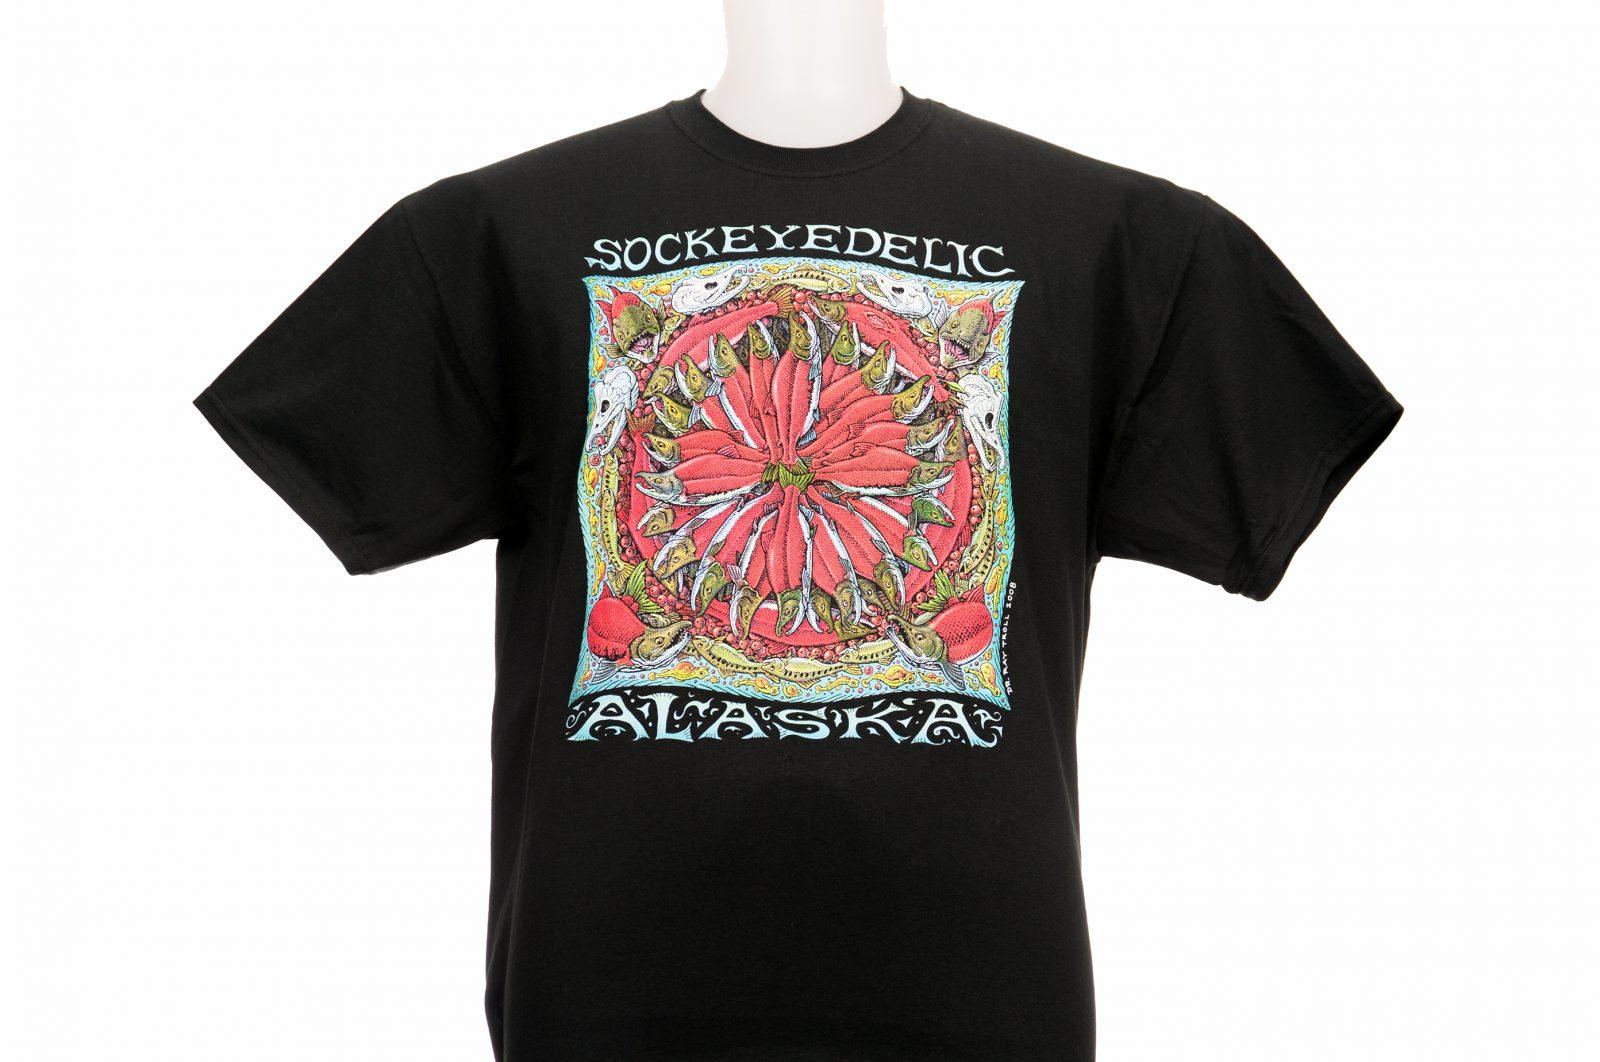 Sockeyedelic Alaska T-shirt